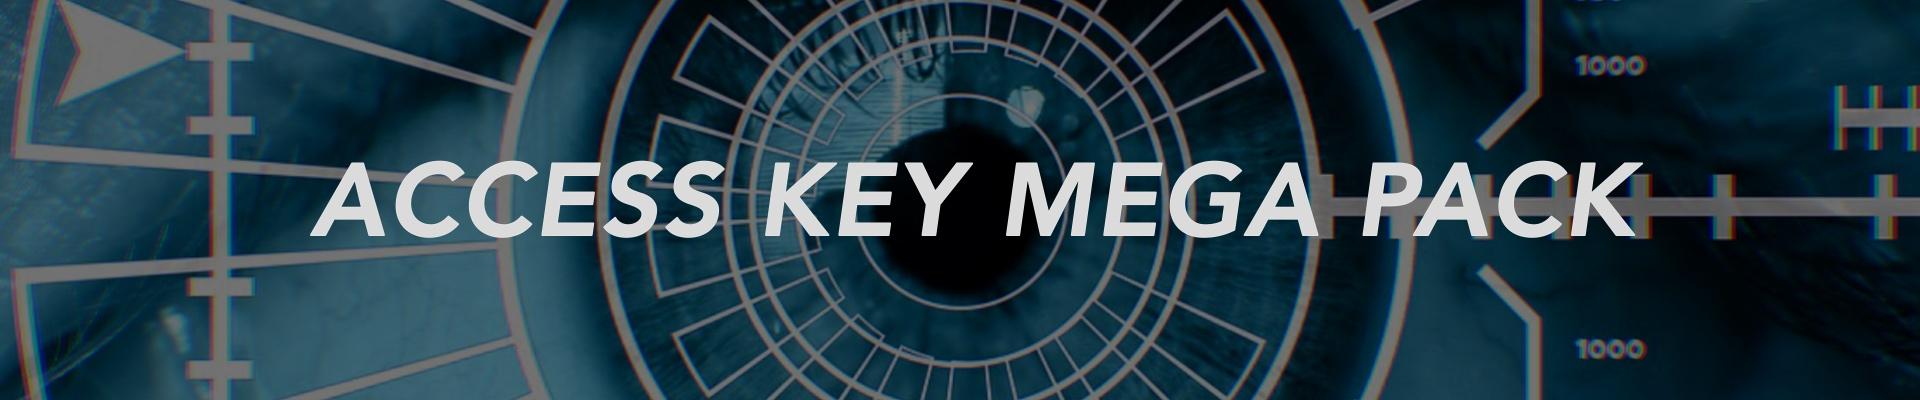 access key mega pack